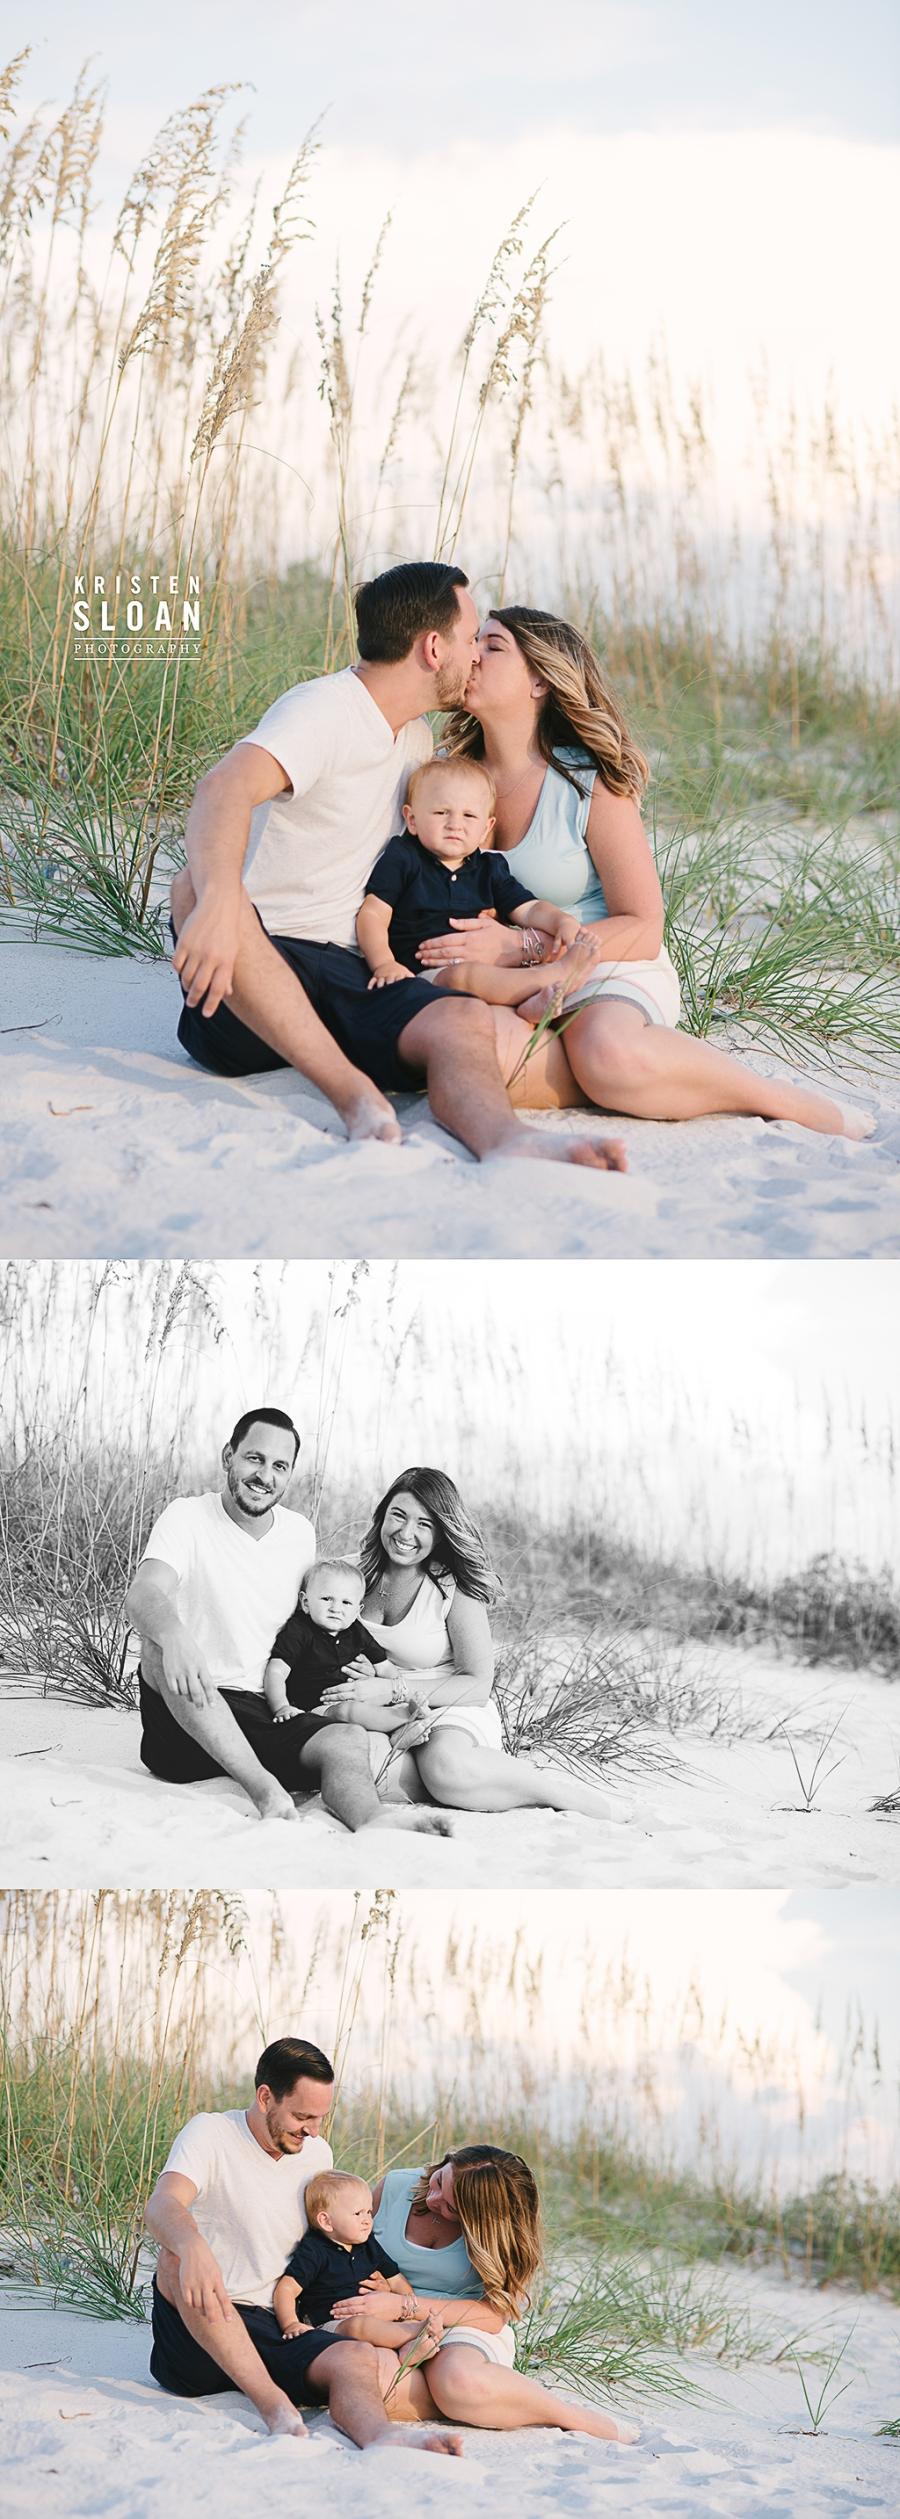 Treasure Island Florida Family Kids Baby Beach Photos | St Pete Beach FL Photographer | Treasure Island Florida Photographer